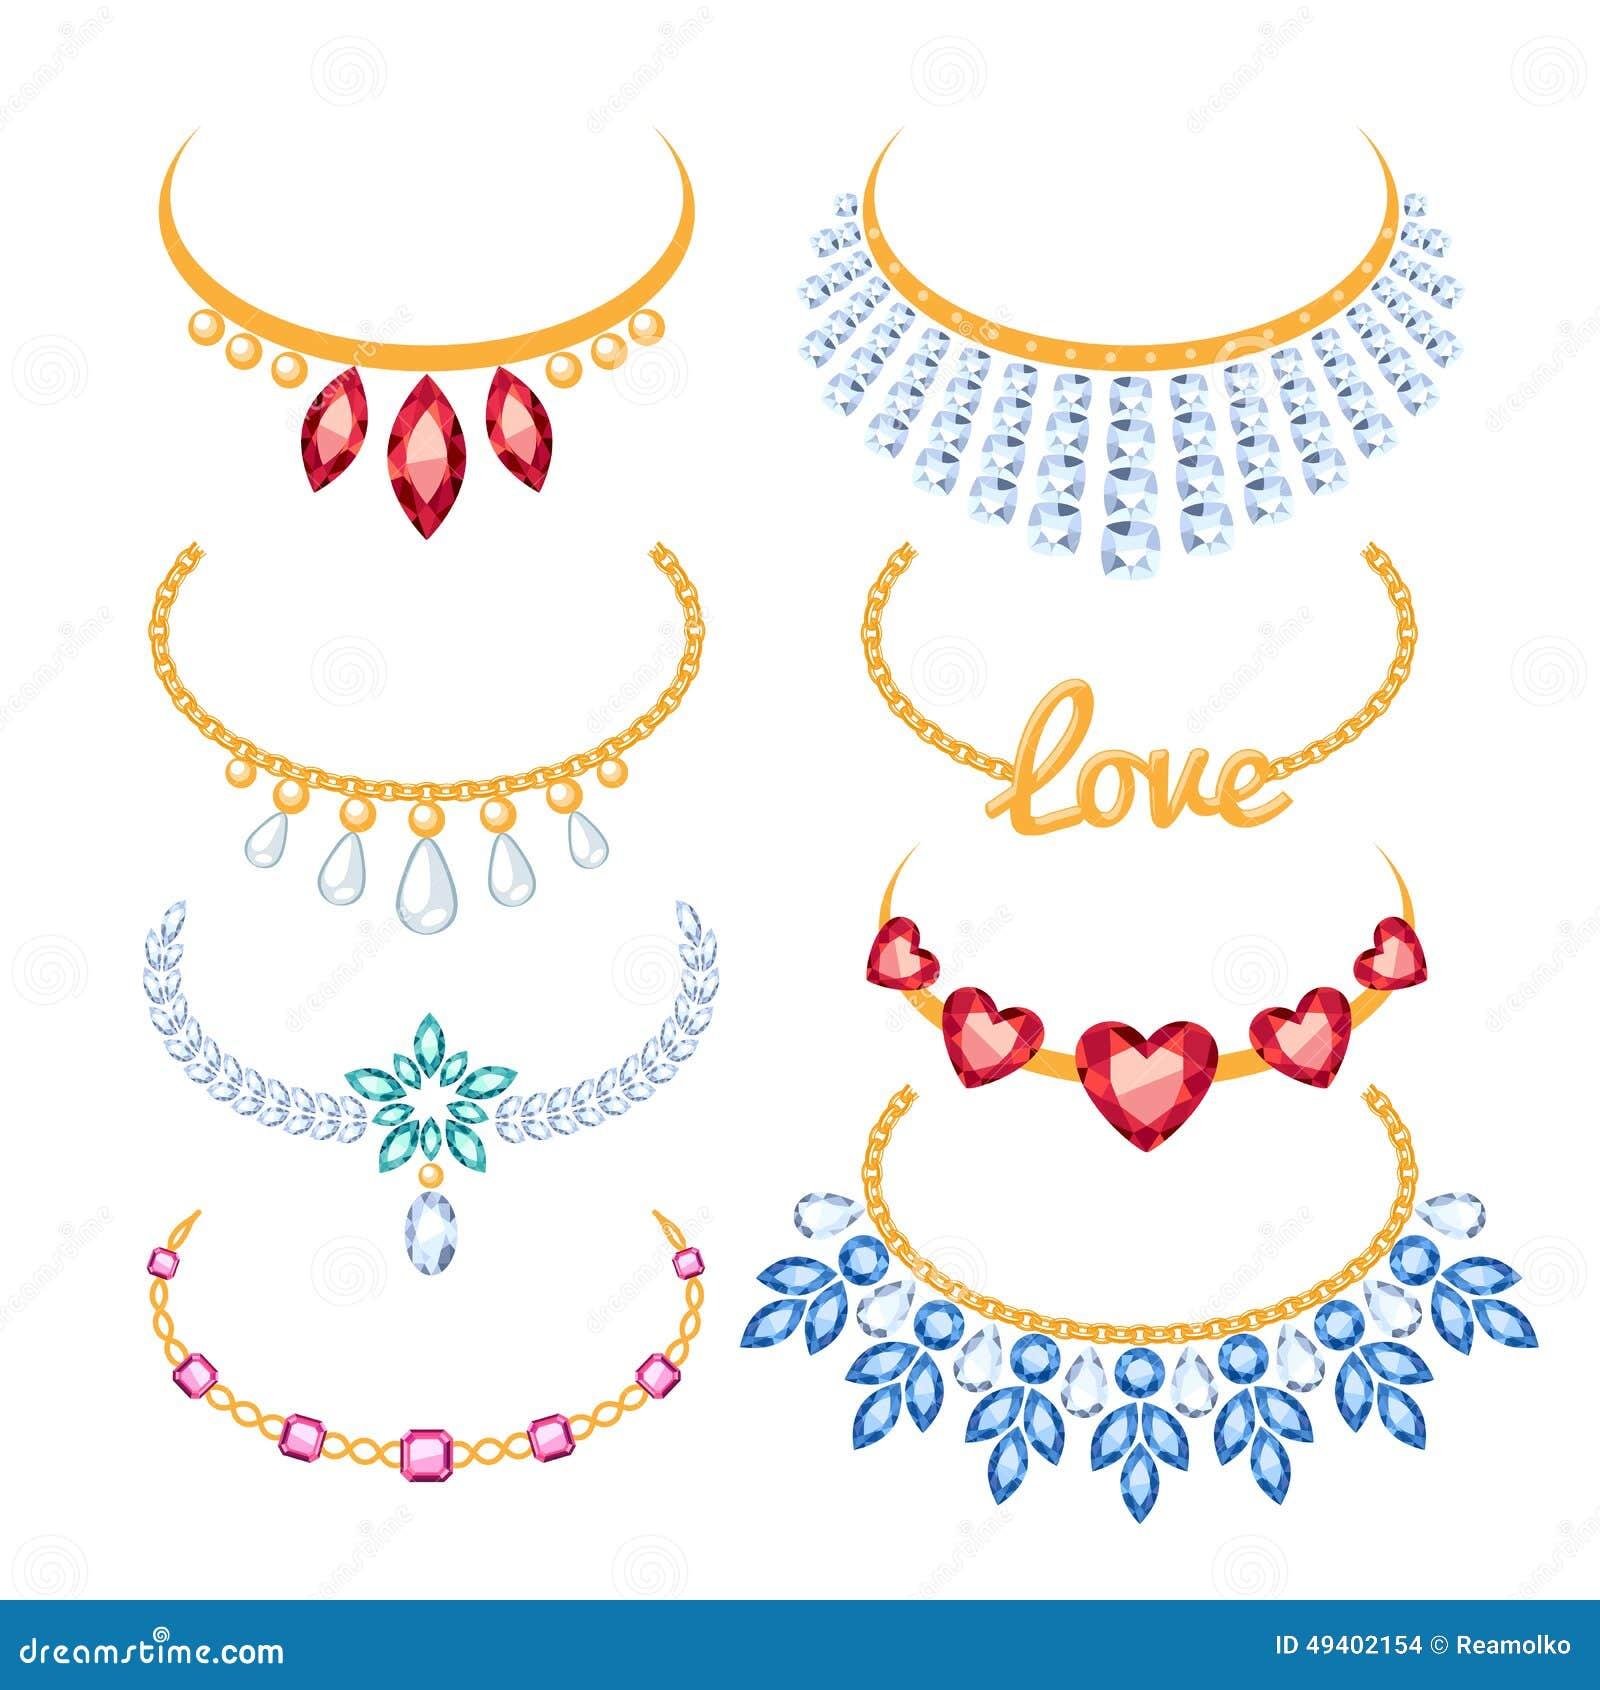 blue sapphire heart necklace